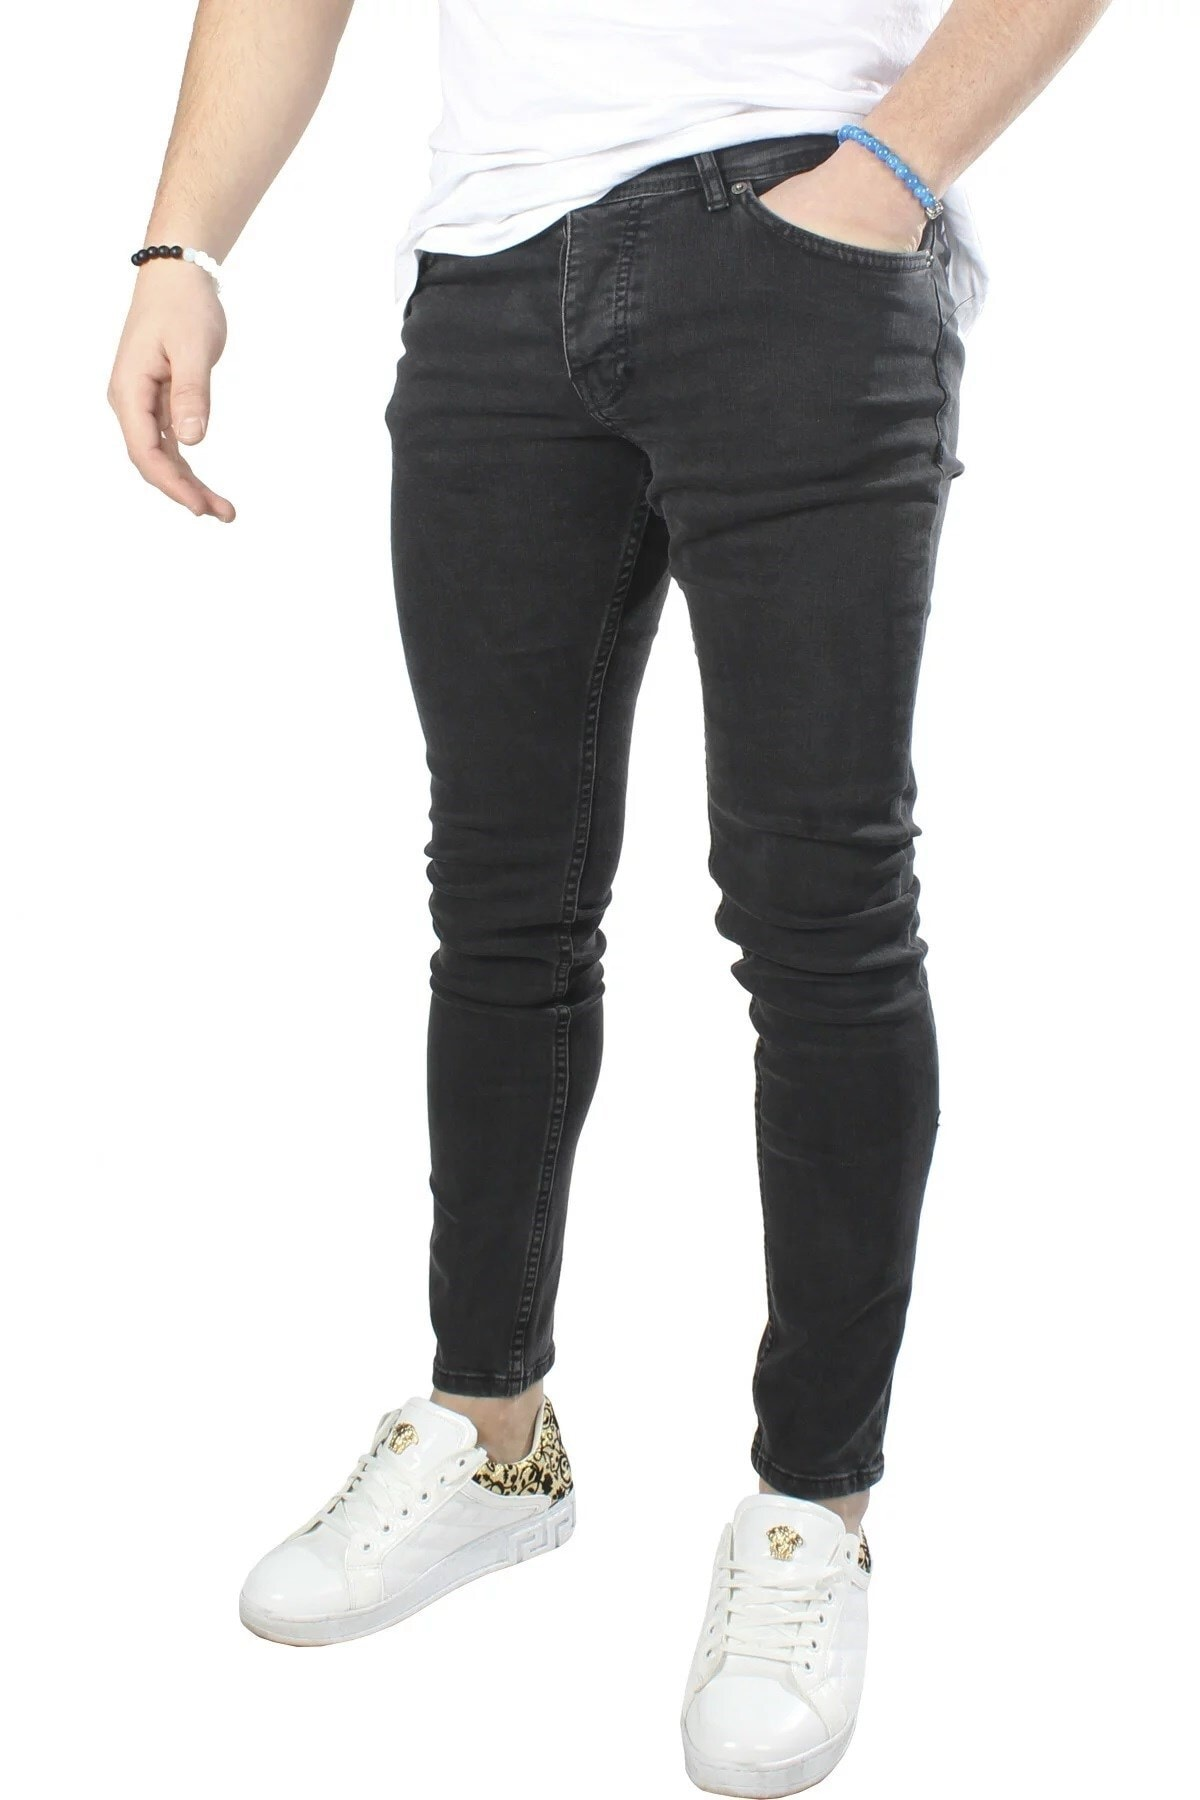 Terapi Men Erkek Kot Pantolon 9K-2100341-007 Füme